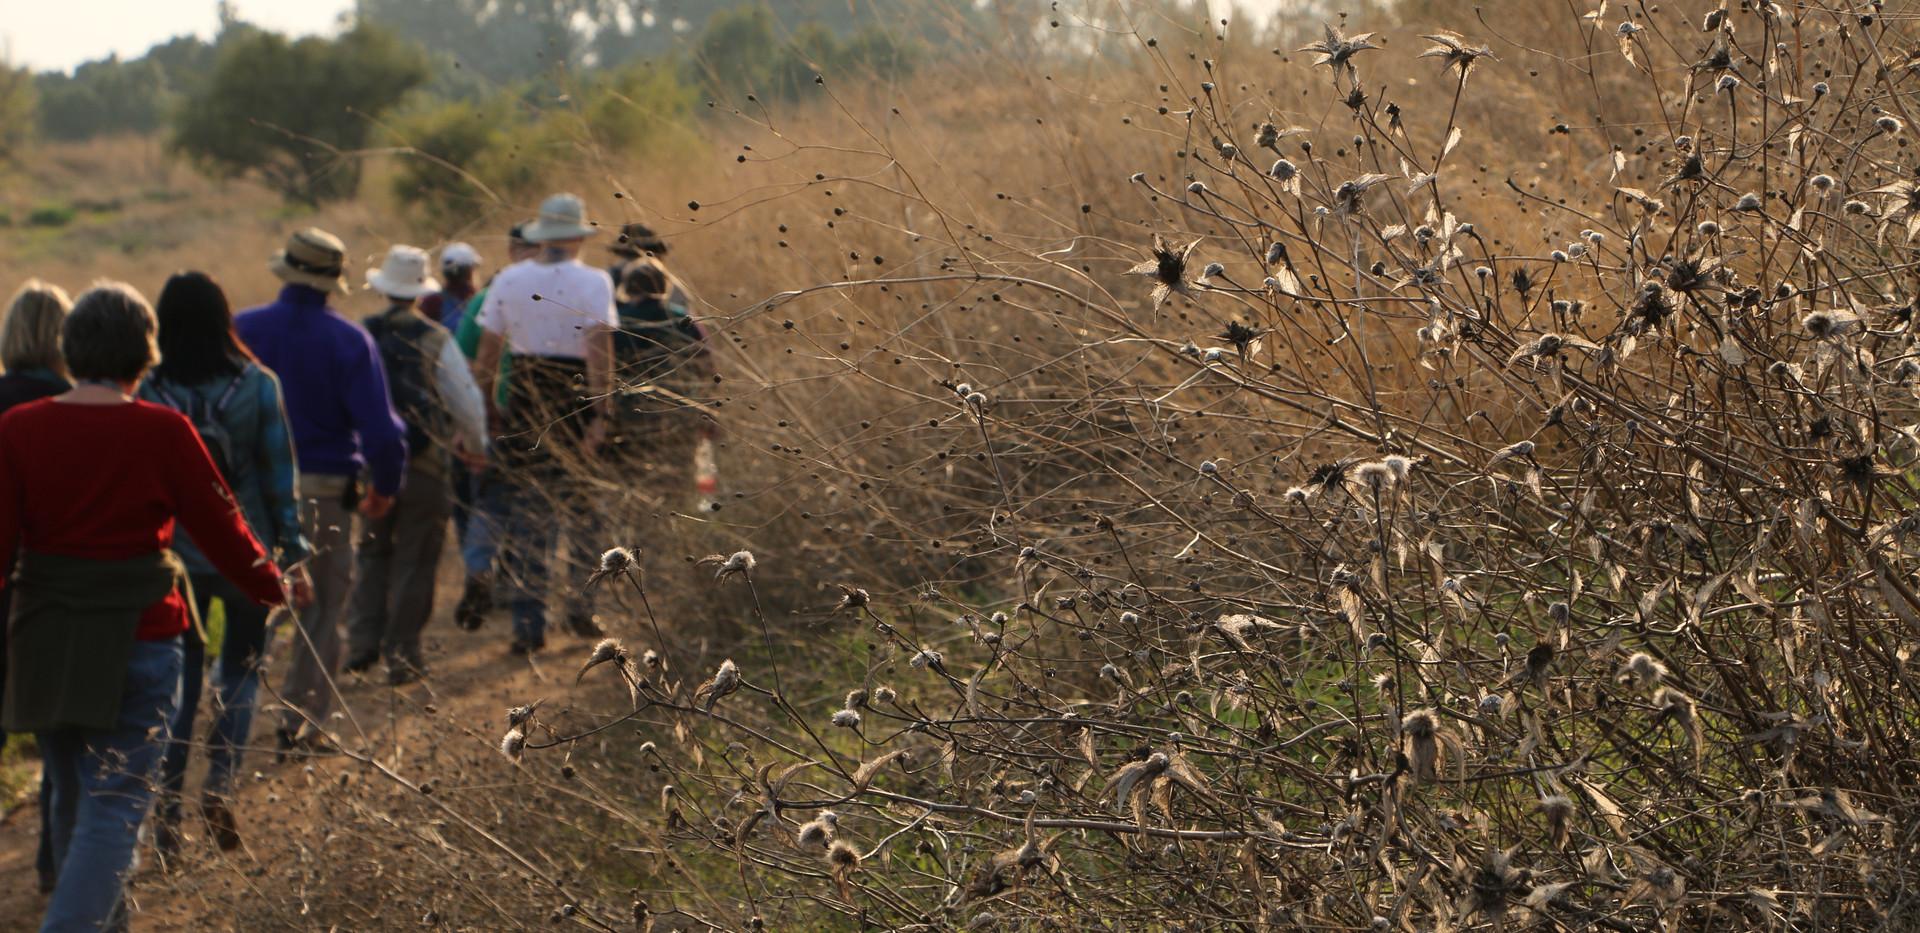 Hiking through Israel.jpg